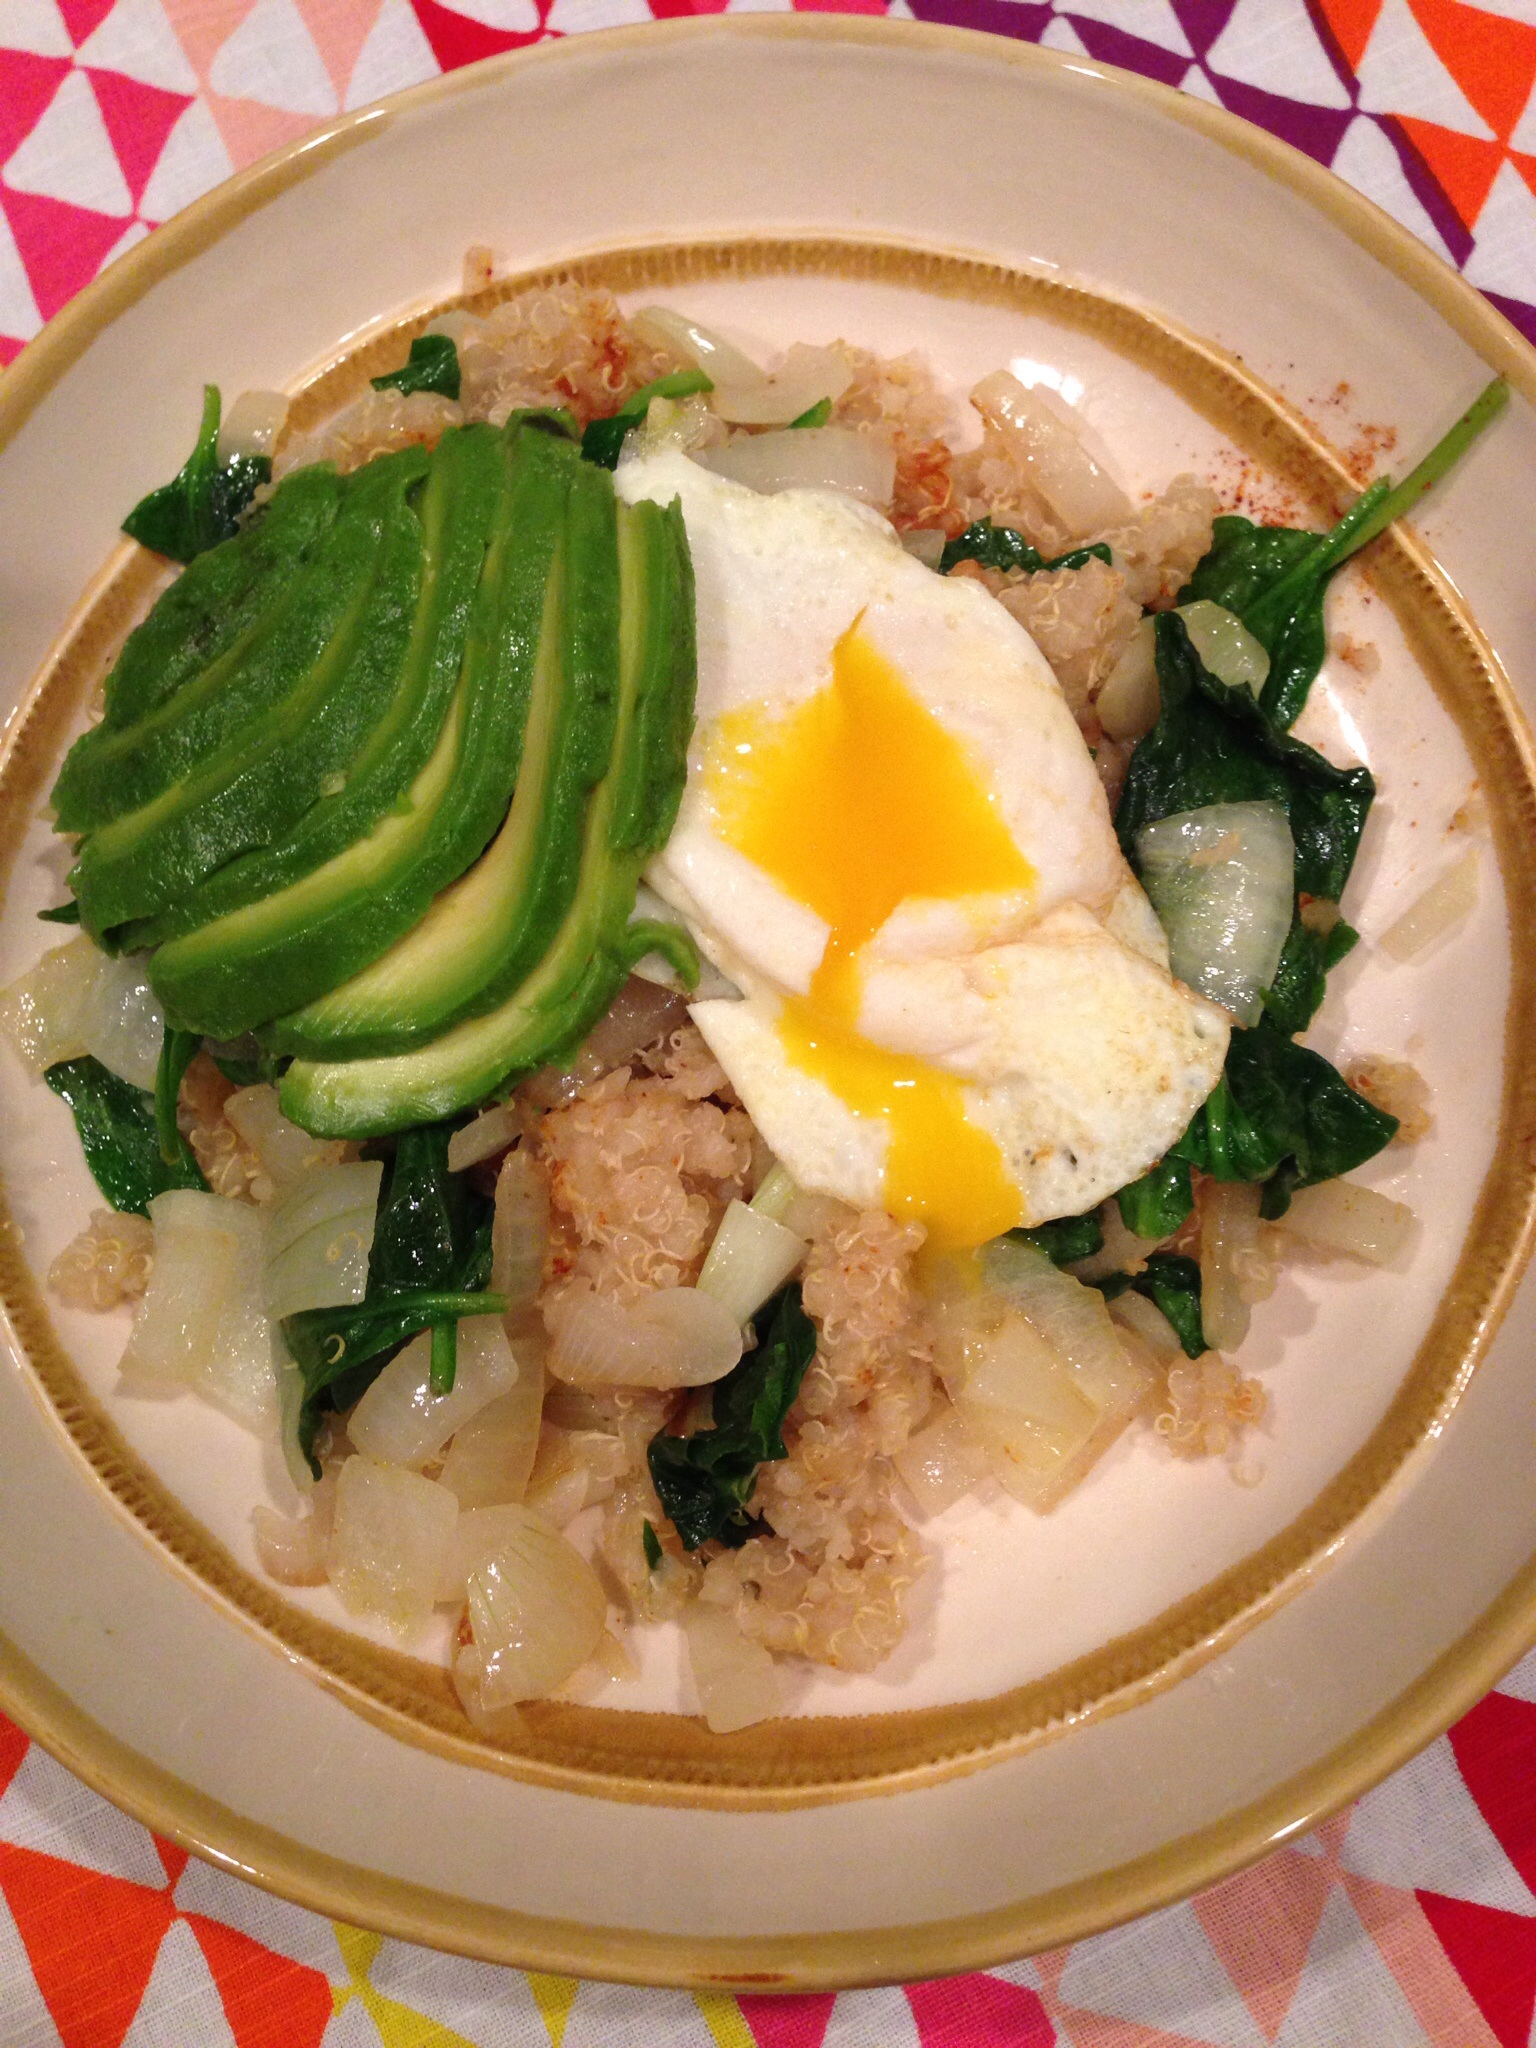 Quinoa, Spinach, Avocado & Egg